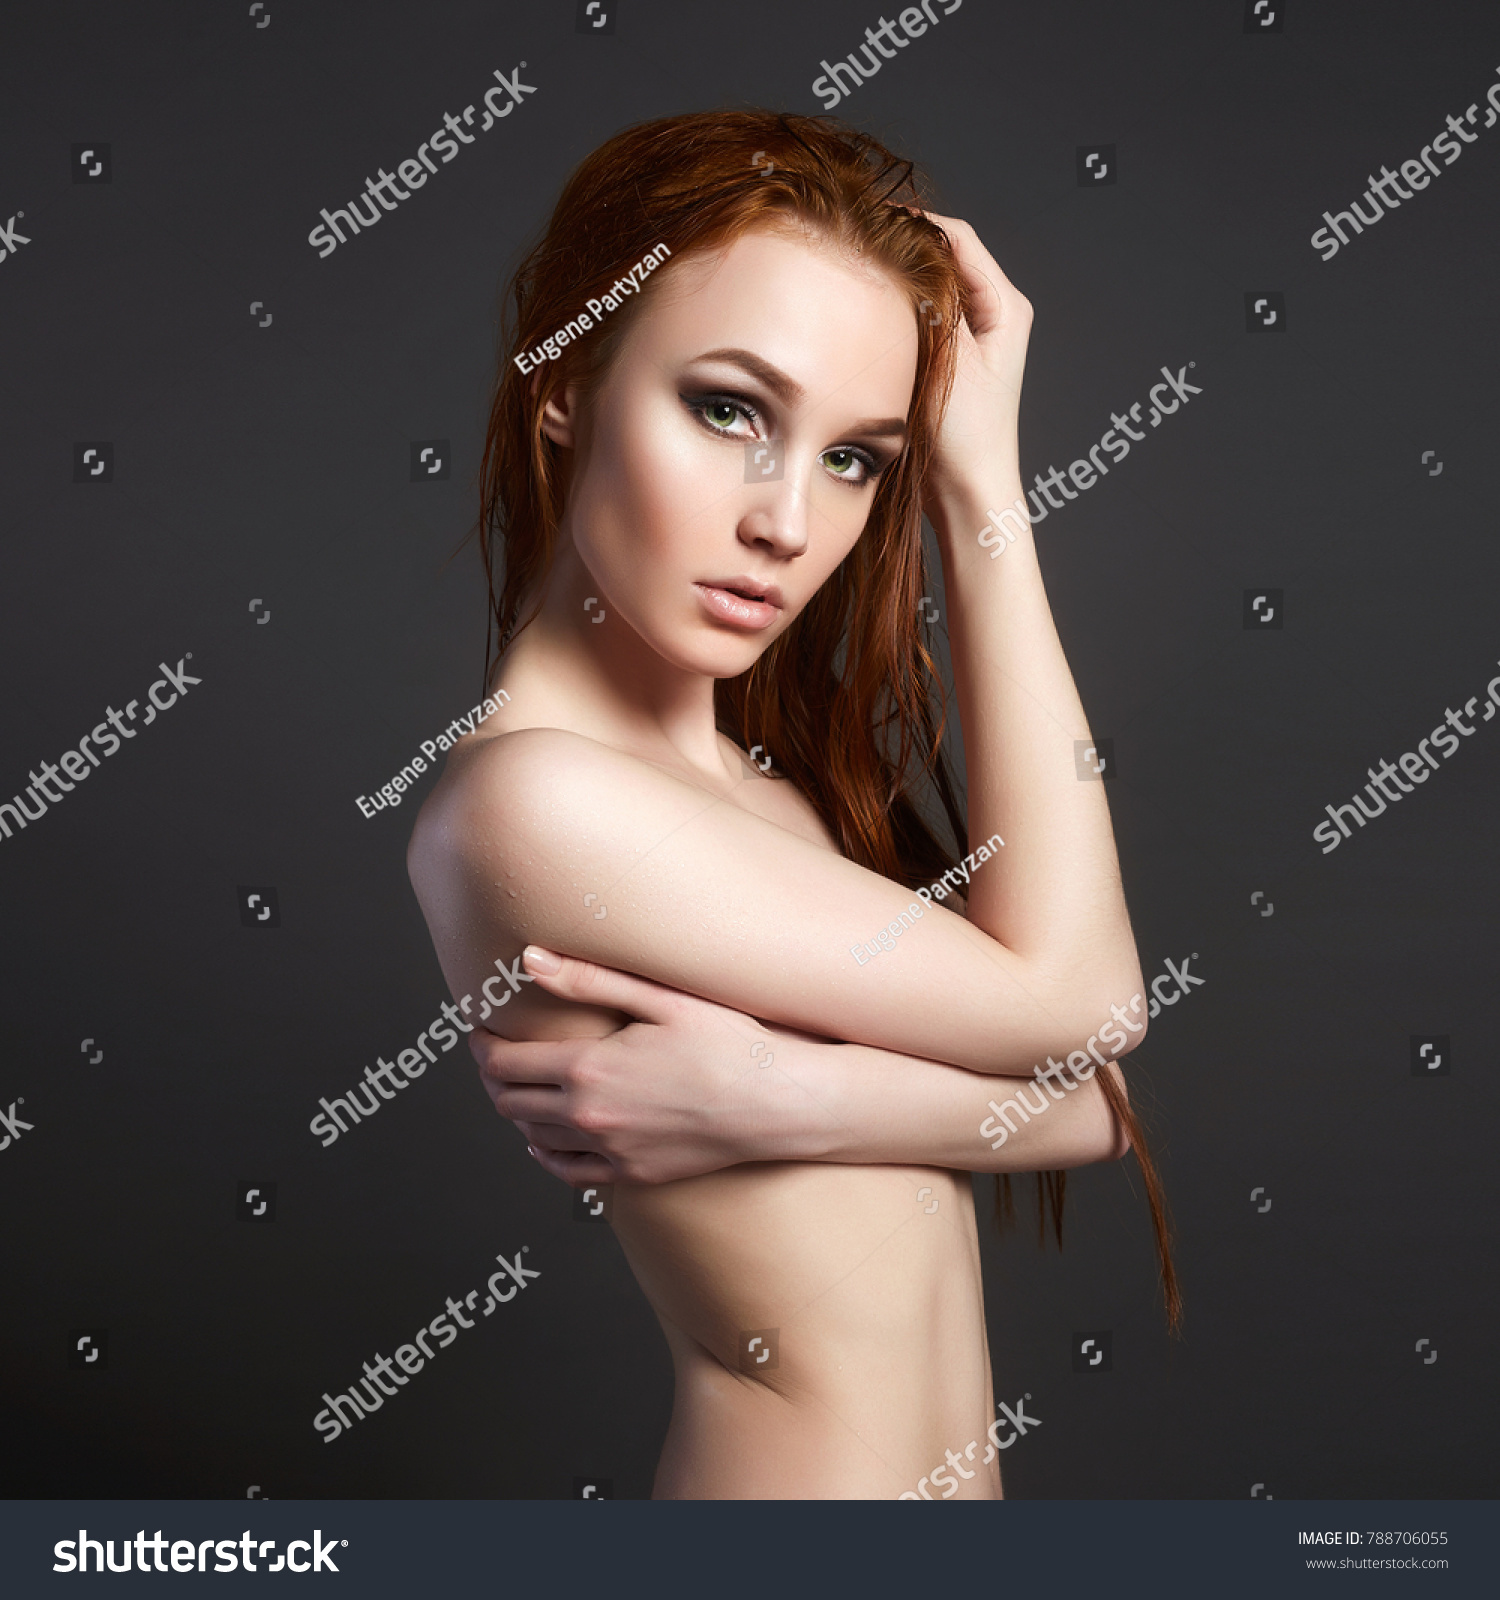 Vietnam girl gina nude